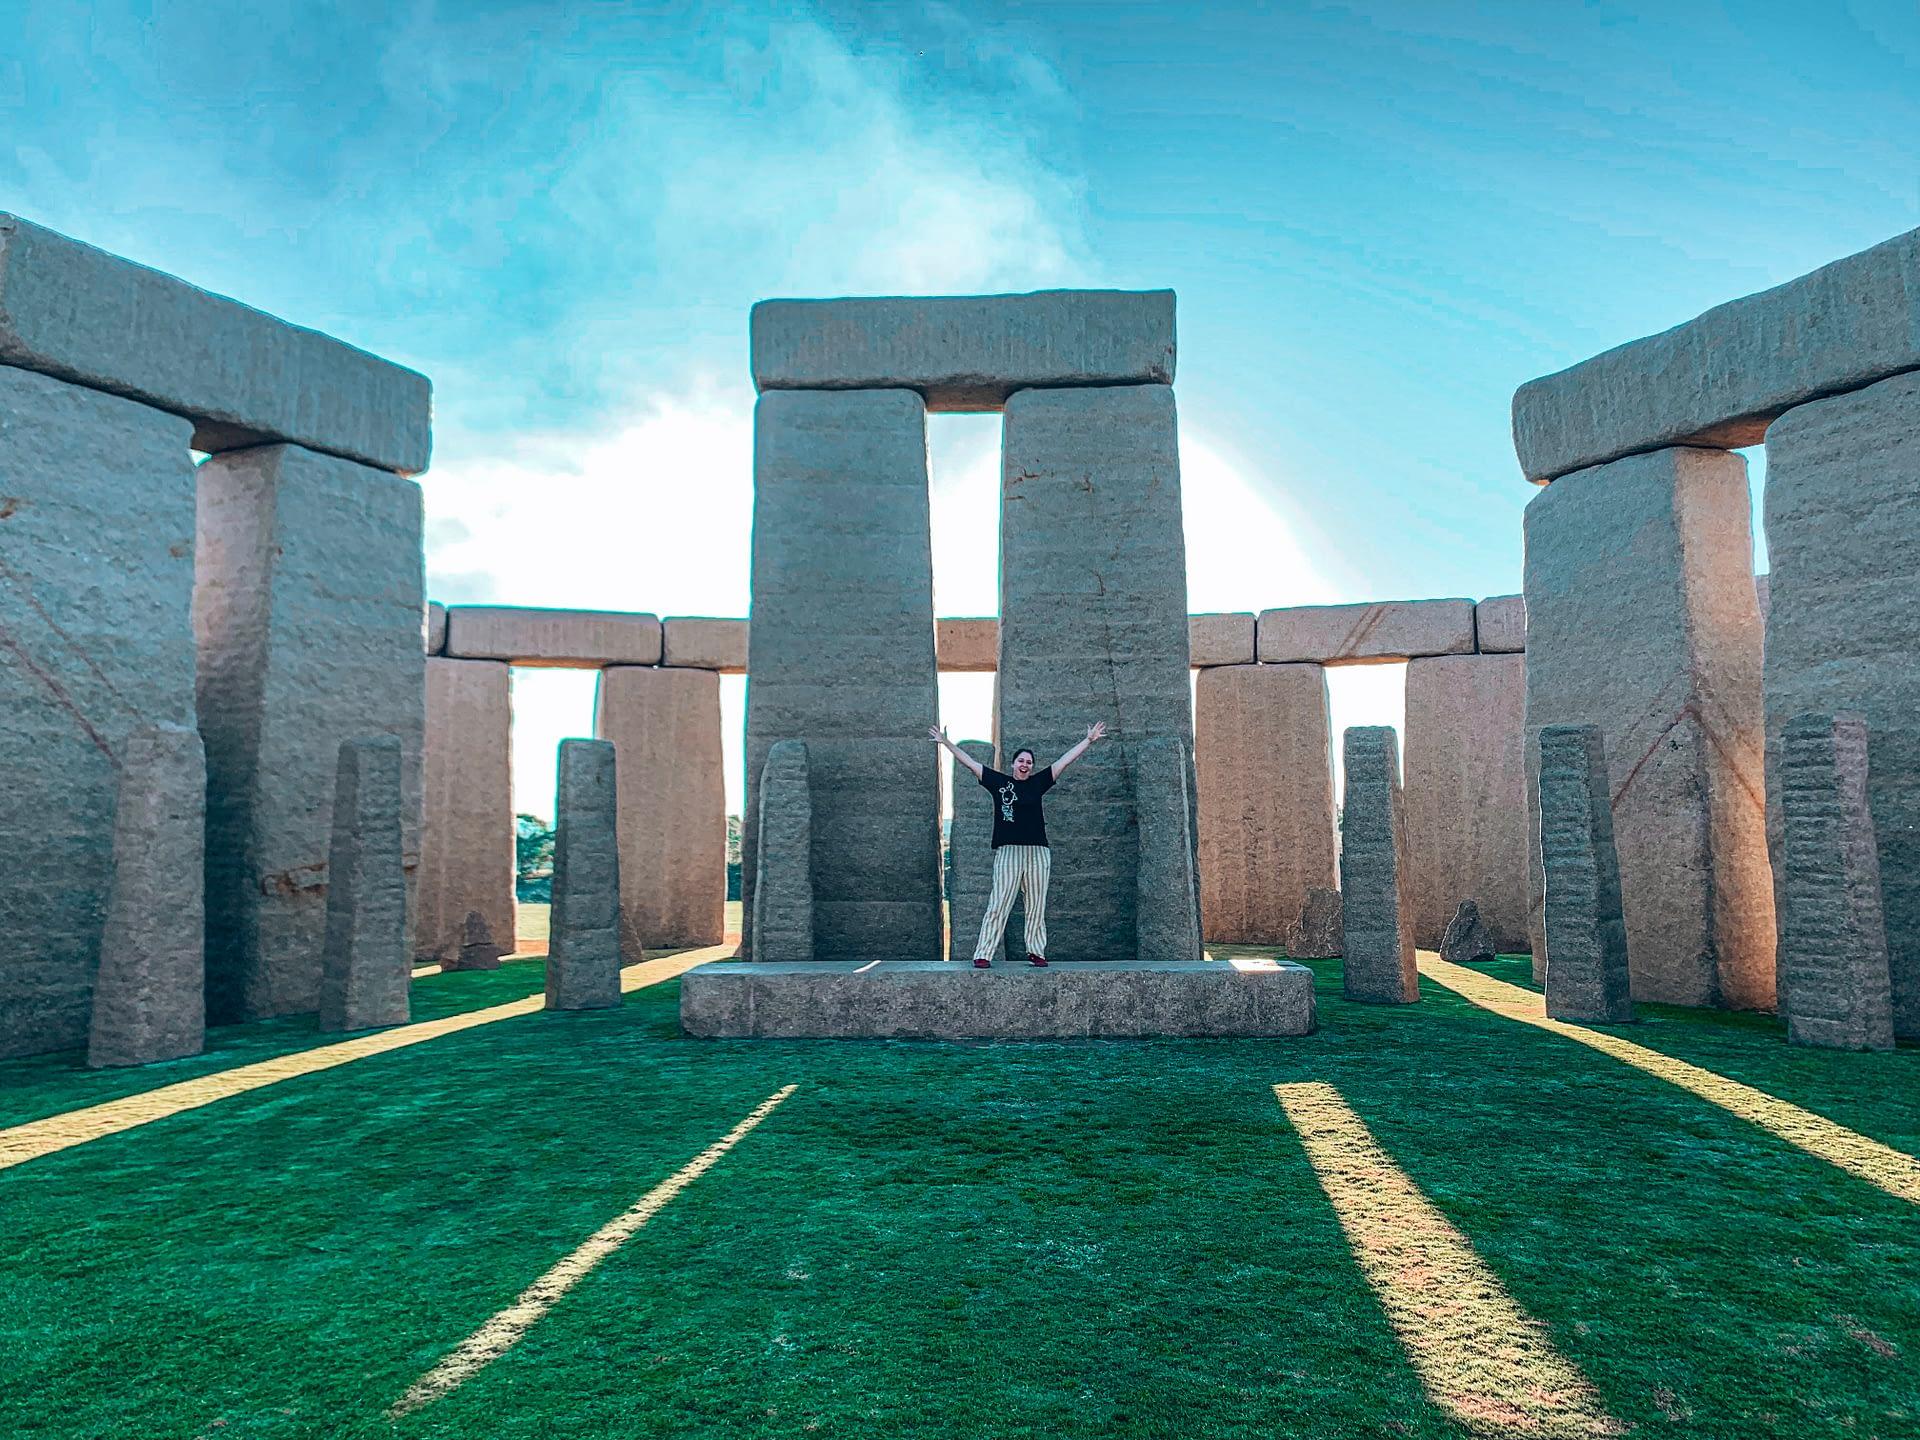 Stone Henge replica in South West Australia